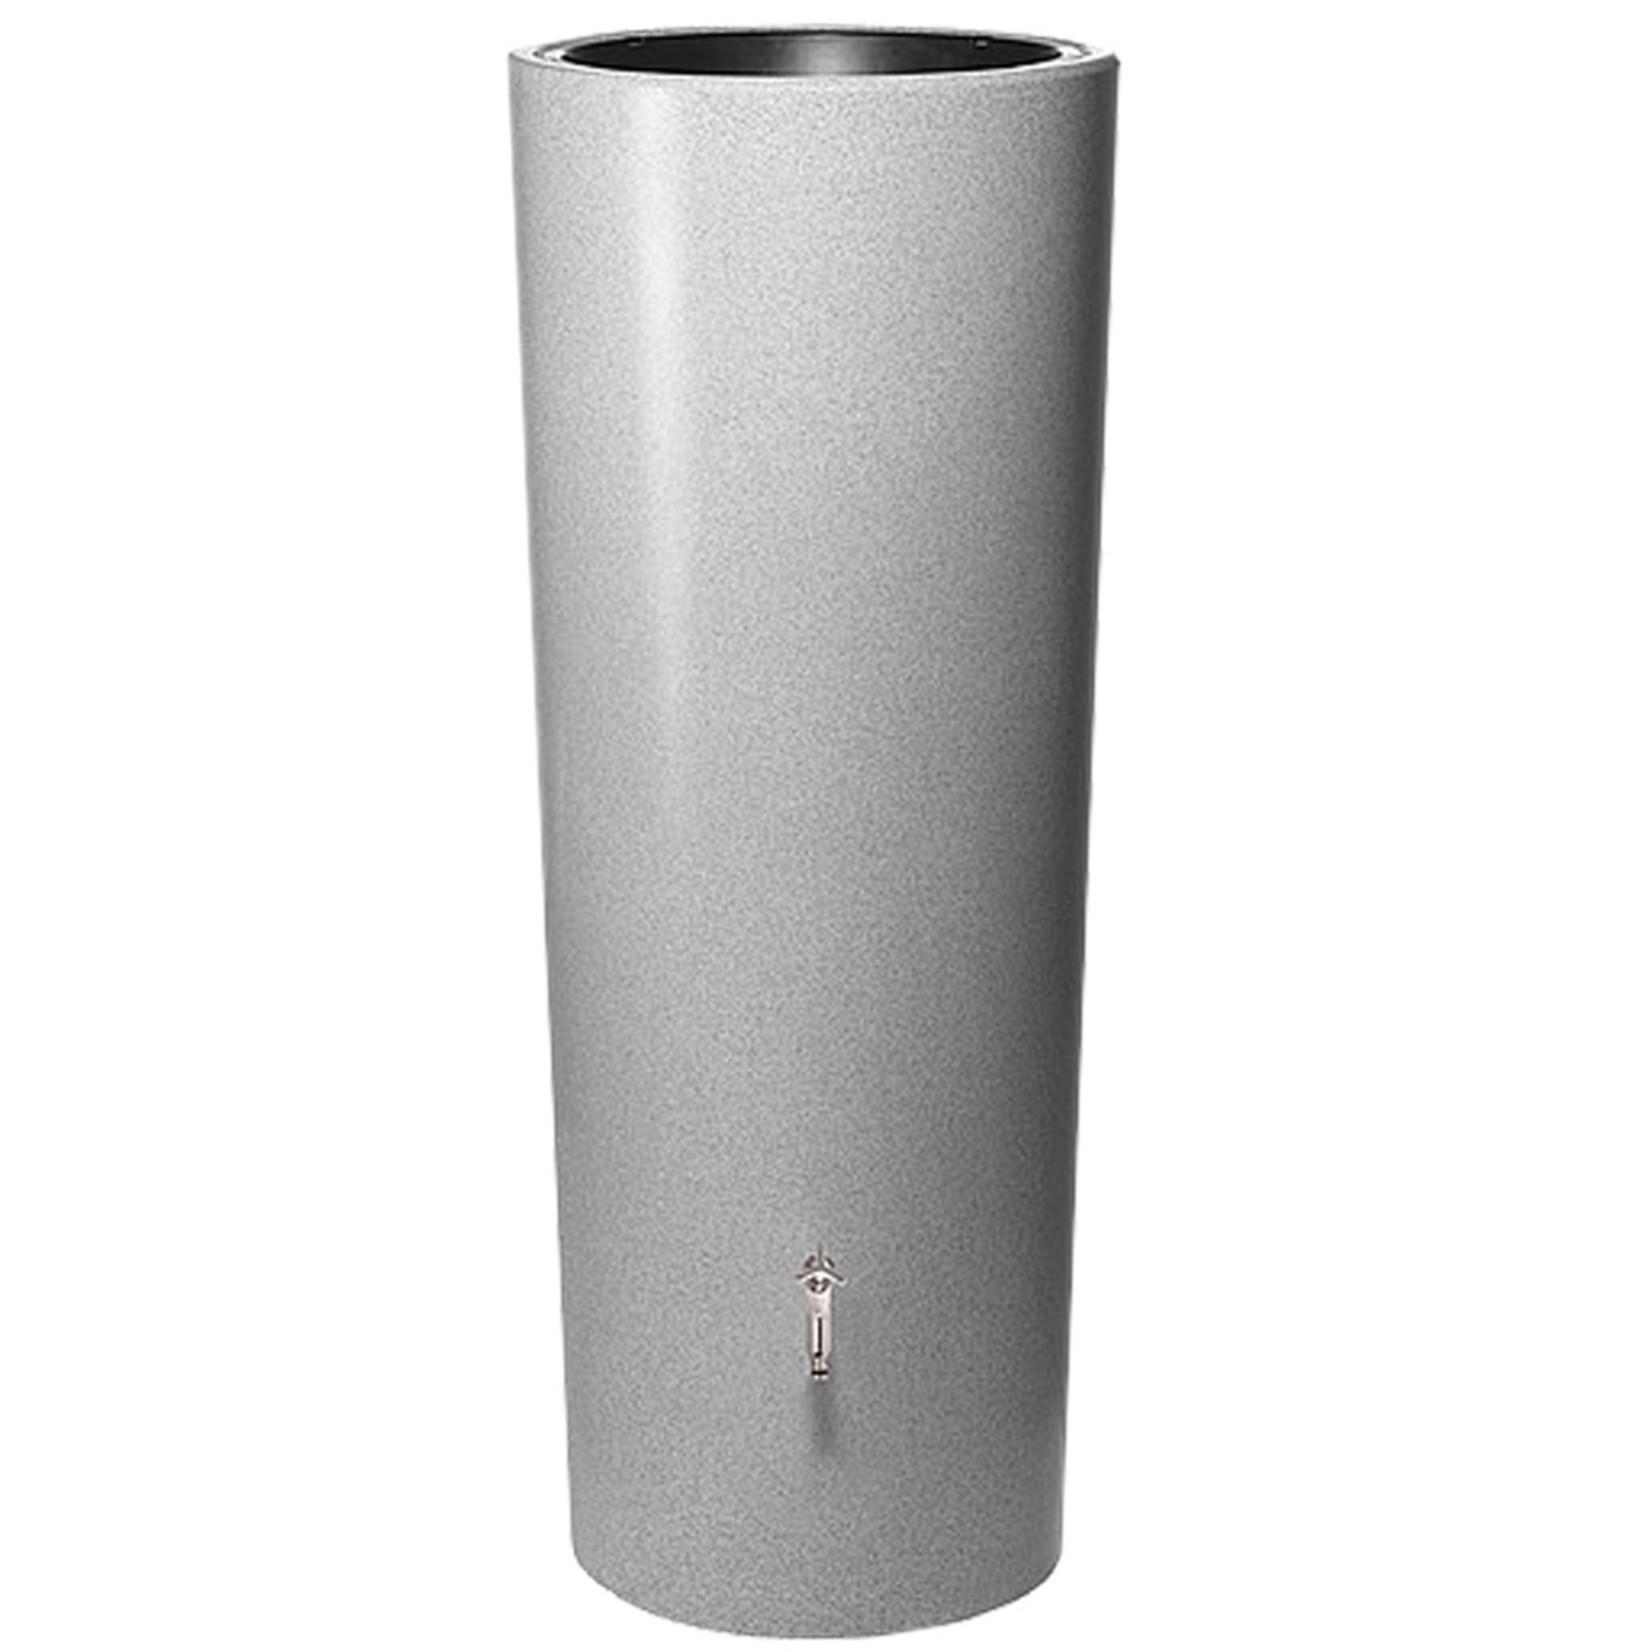 Garantia 2in1 ton STONE 350 ltr Silver